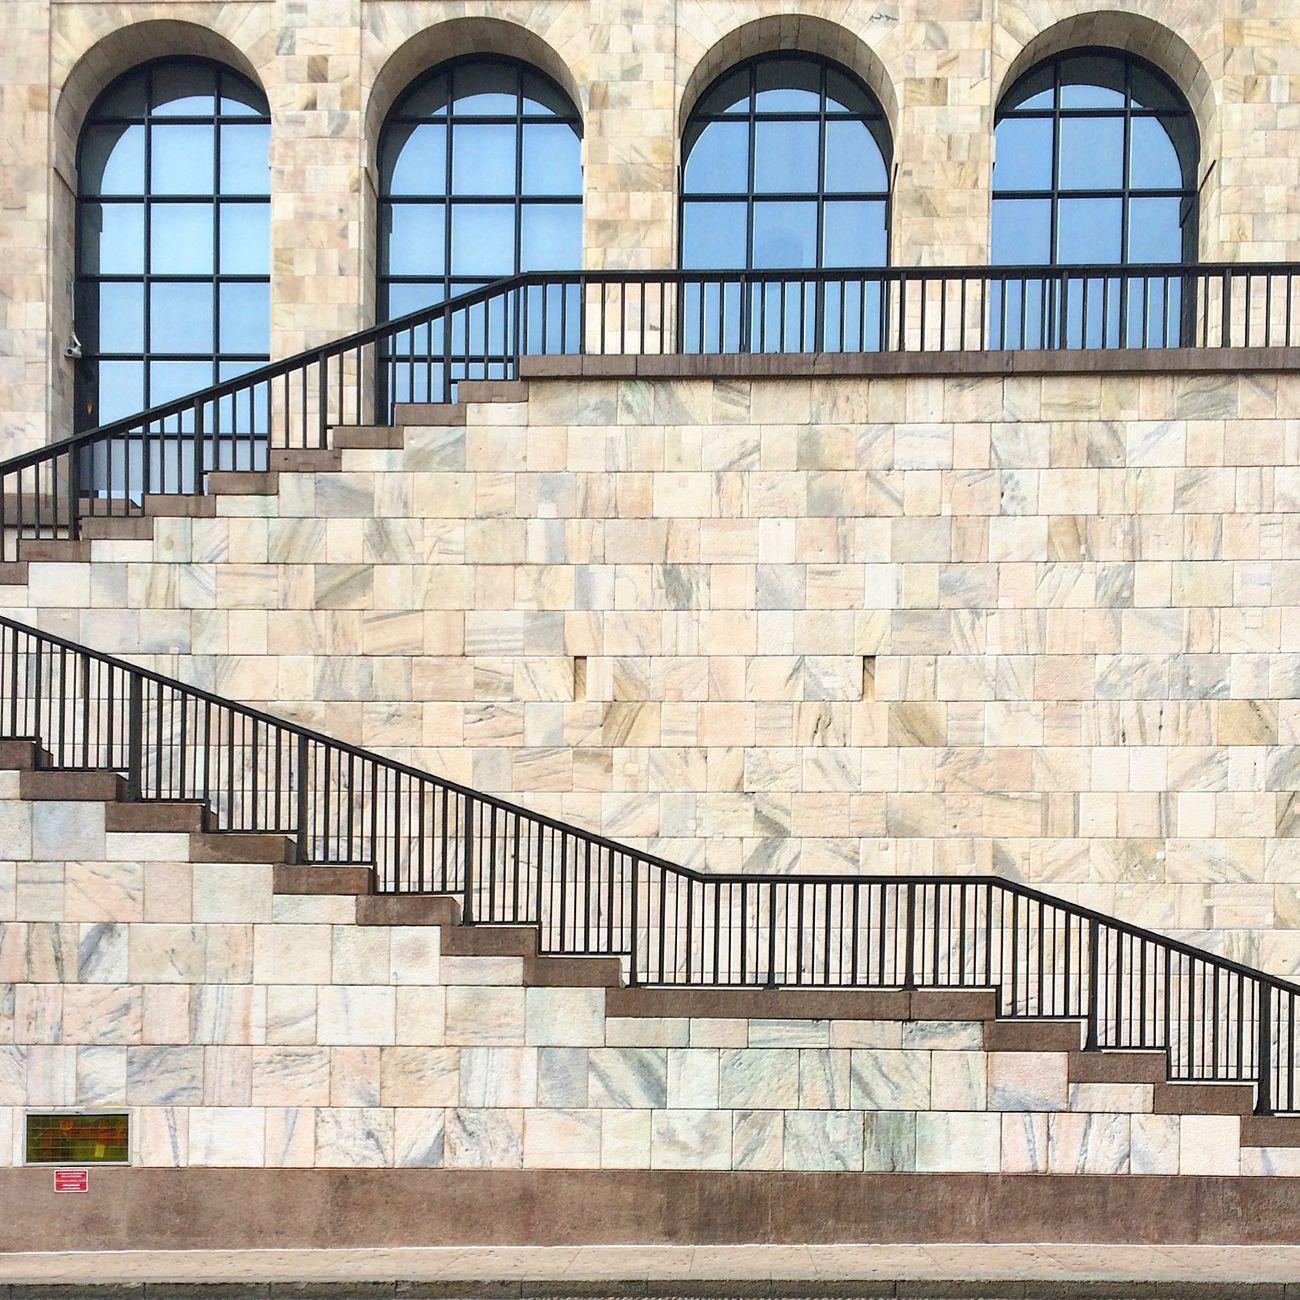 Mymilan Milano Lombardia Italy Piazzaduomo Museo Del Novecento Museo City Architecture Architectural Detail Milanodavivere